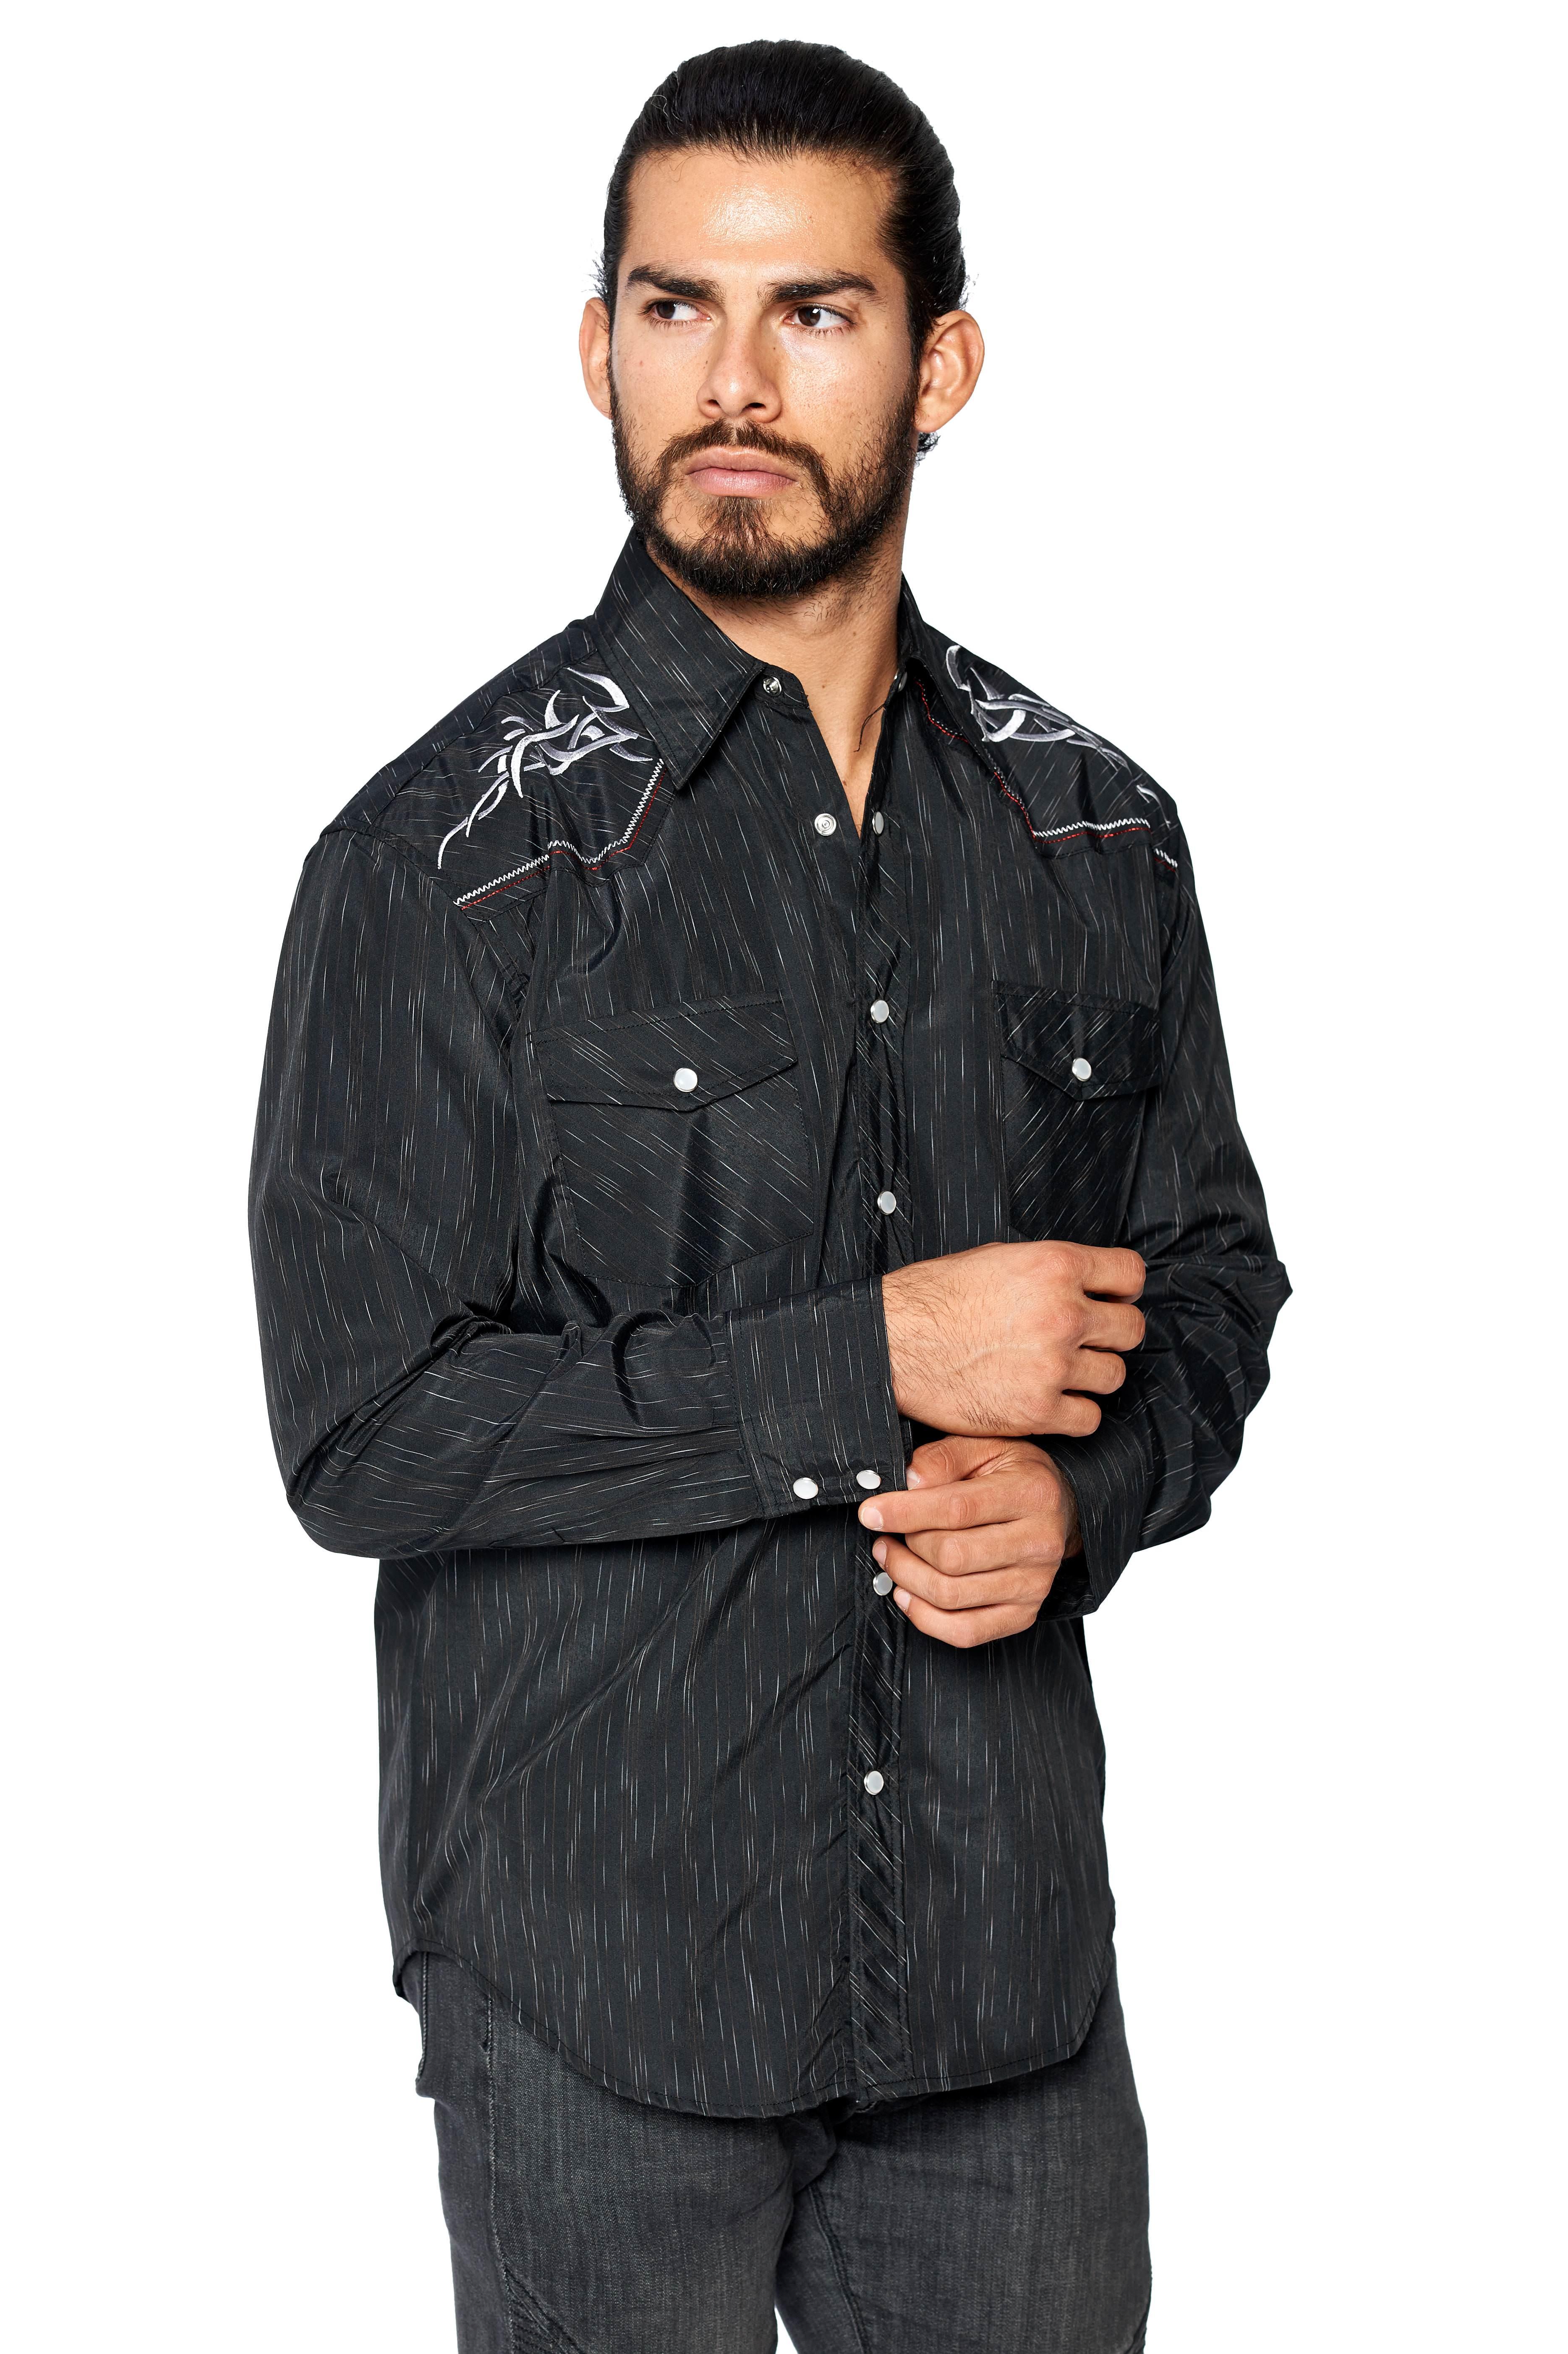 LW-Men-039-s-Pearl-Snap-Tribal-Stylish-Printed-Woven-Western-Vaquero-Rodeo-Shirt thumbnail 76